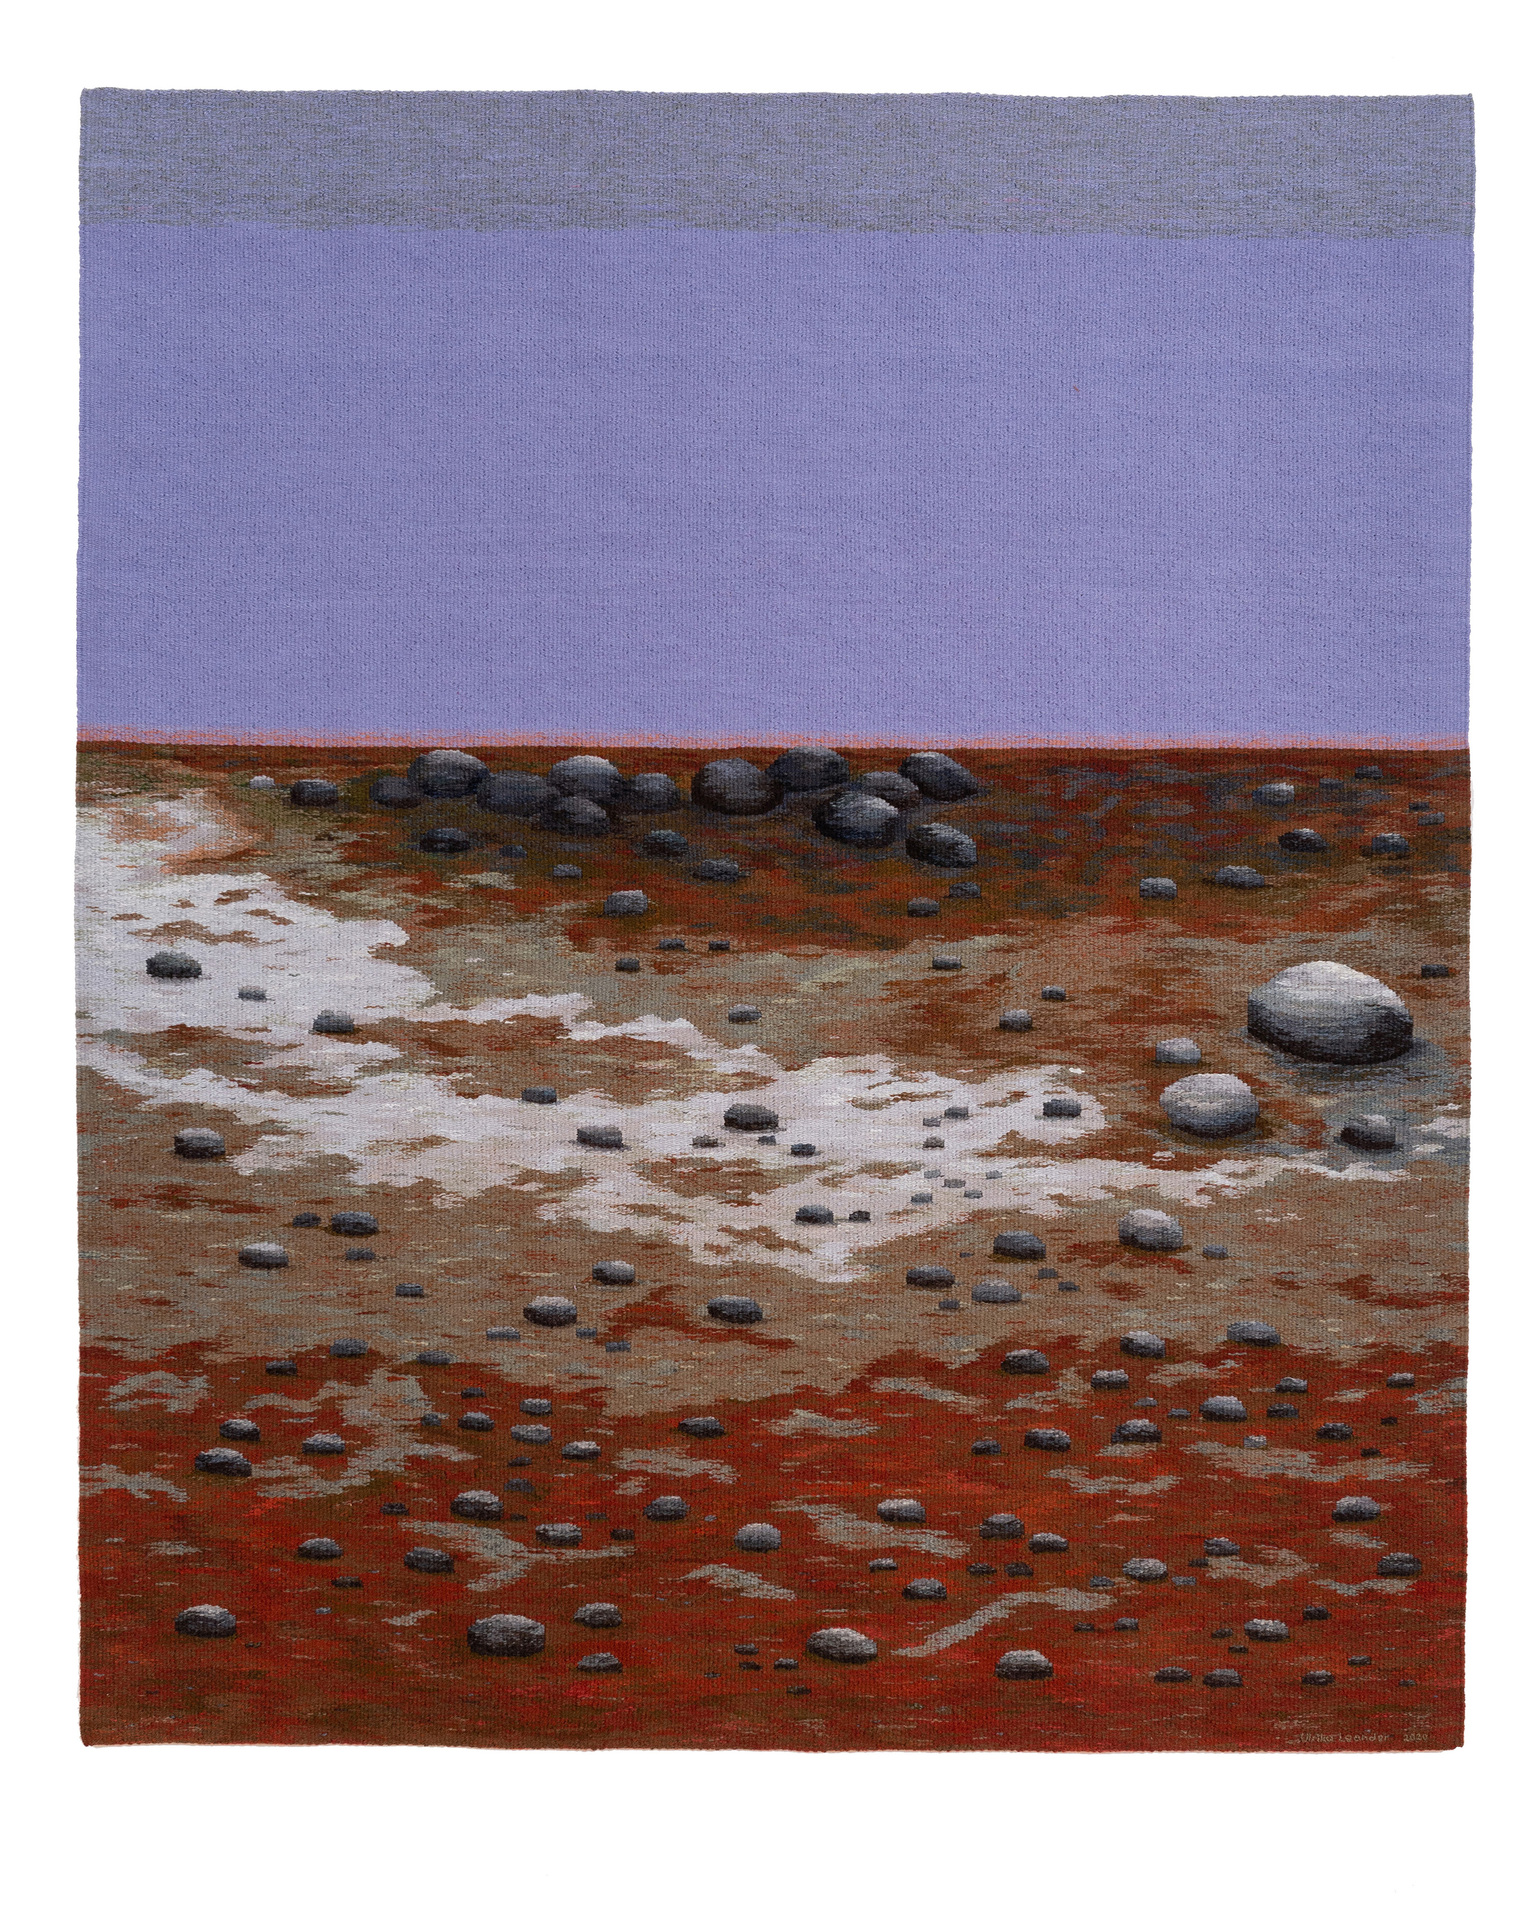 Ulrika Leander, Norris—Fiber/Textile